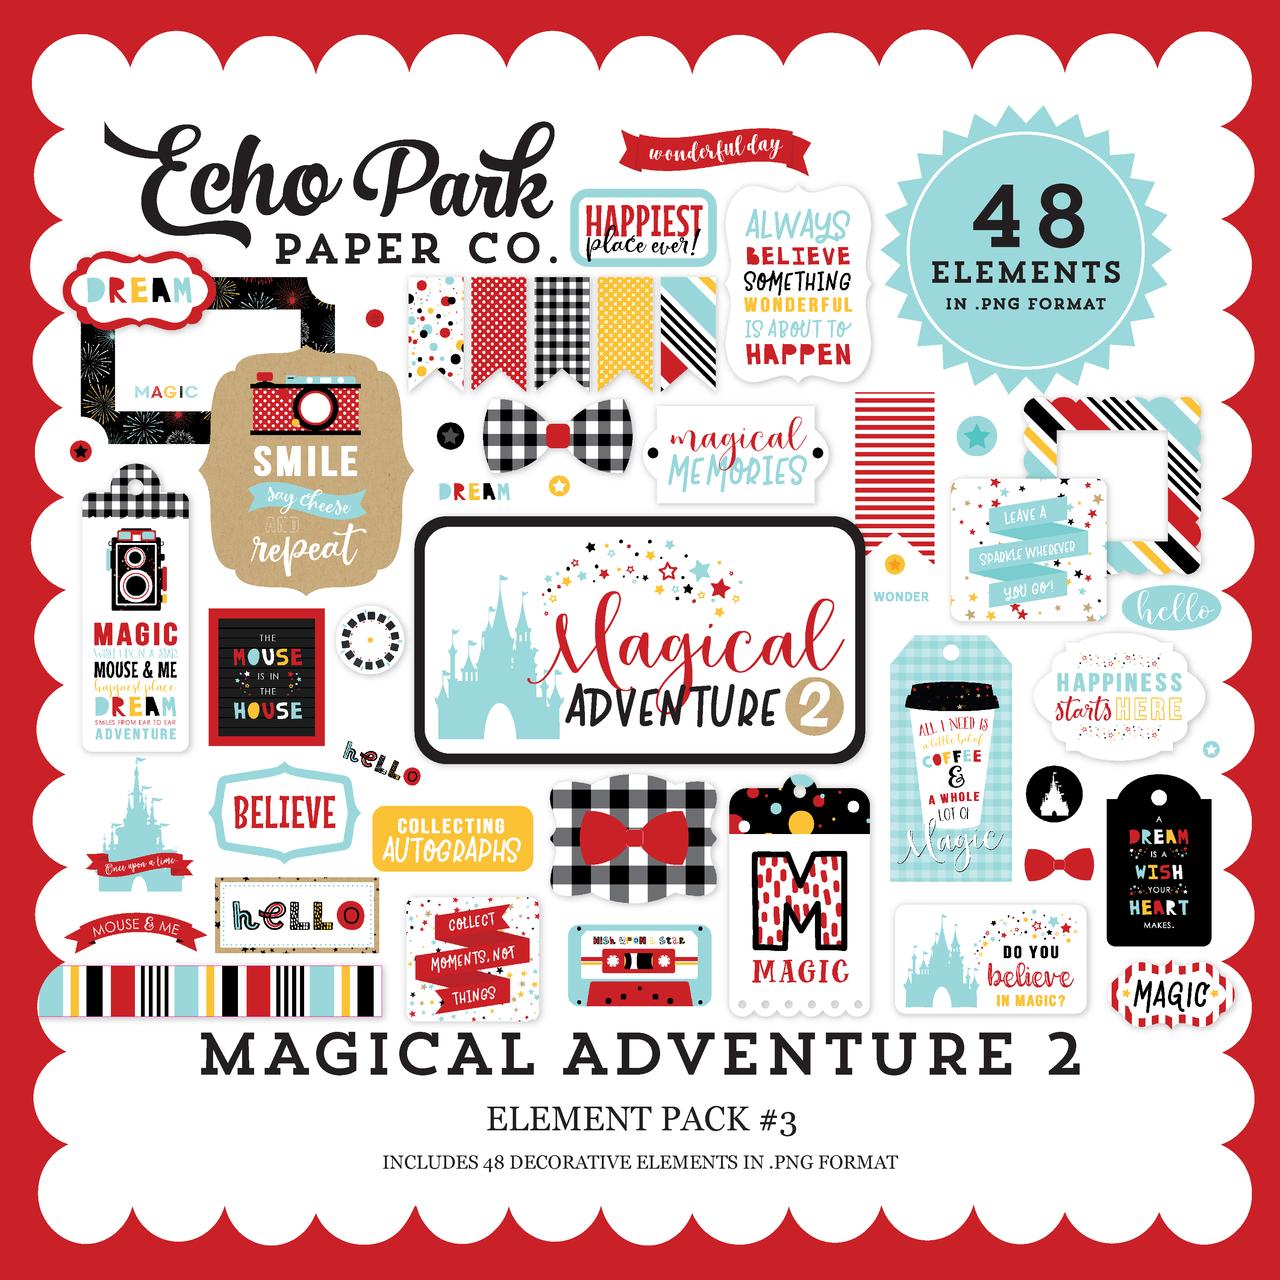 Magical Adventure 2 Element Pack #3